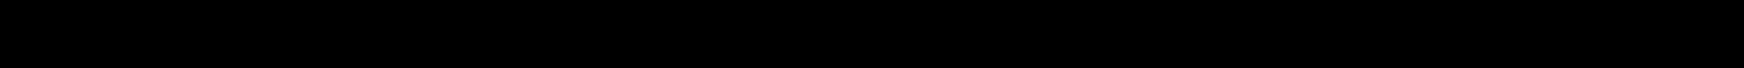 cfmajerg-Alt_webfont.ttf